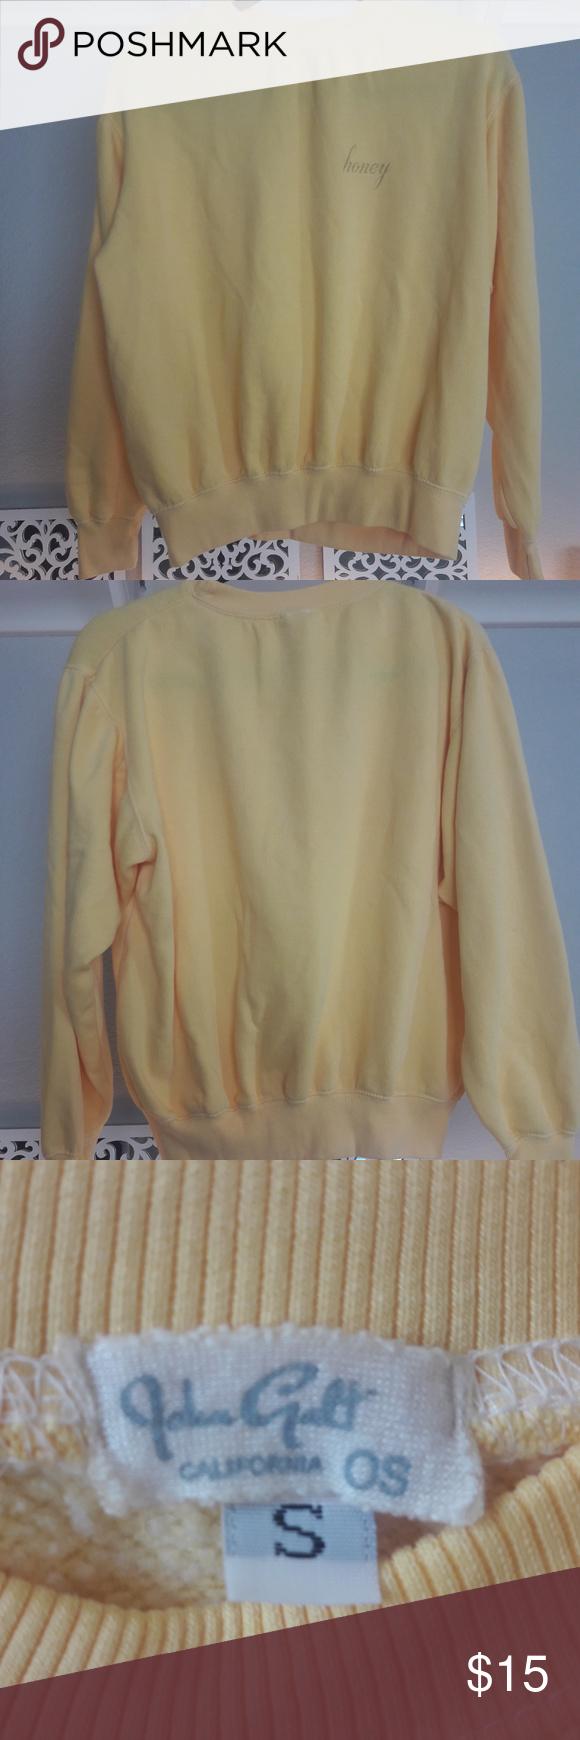 John Galt Brandy Melville Honey Sweatshirt Brandy Melville